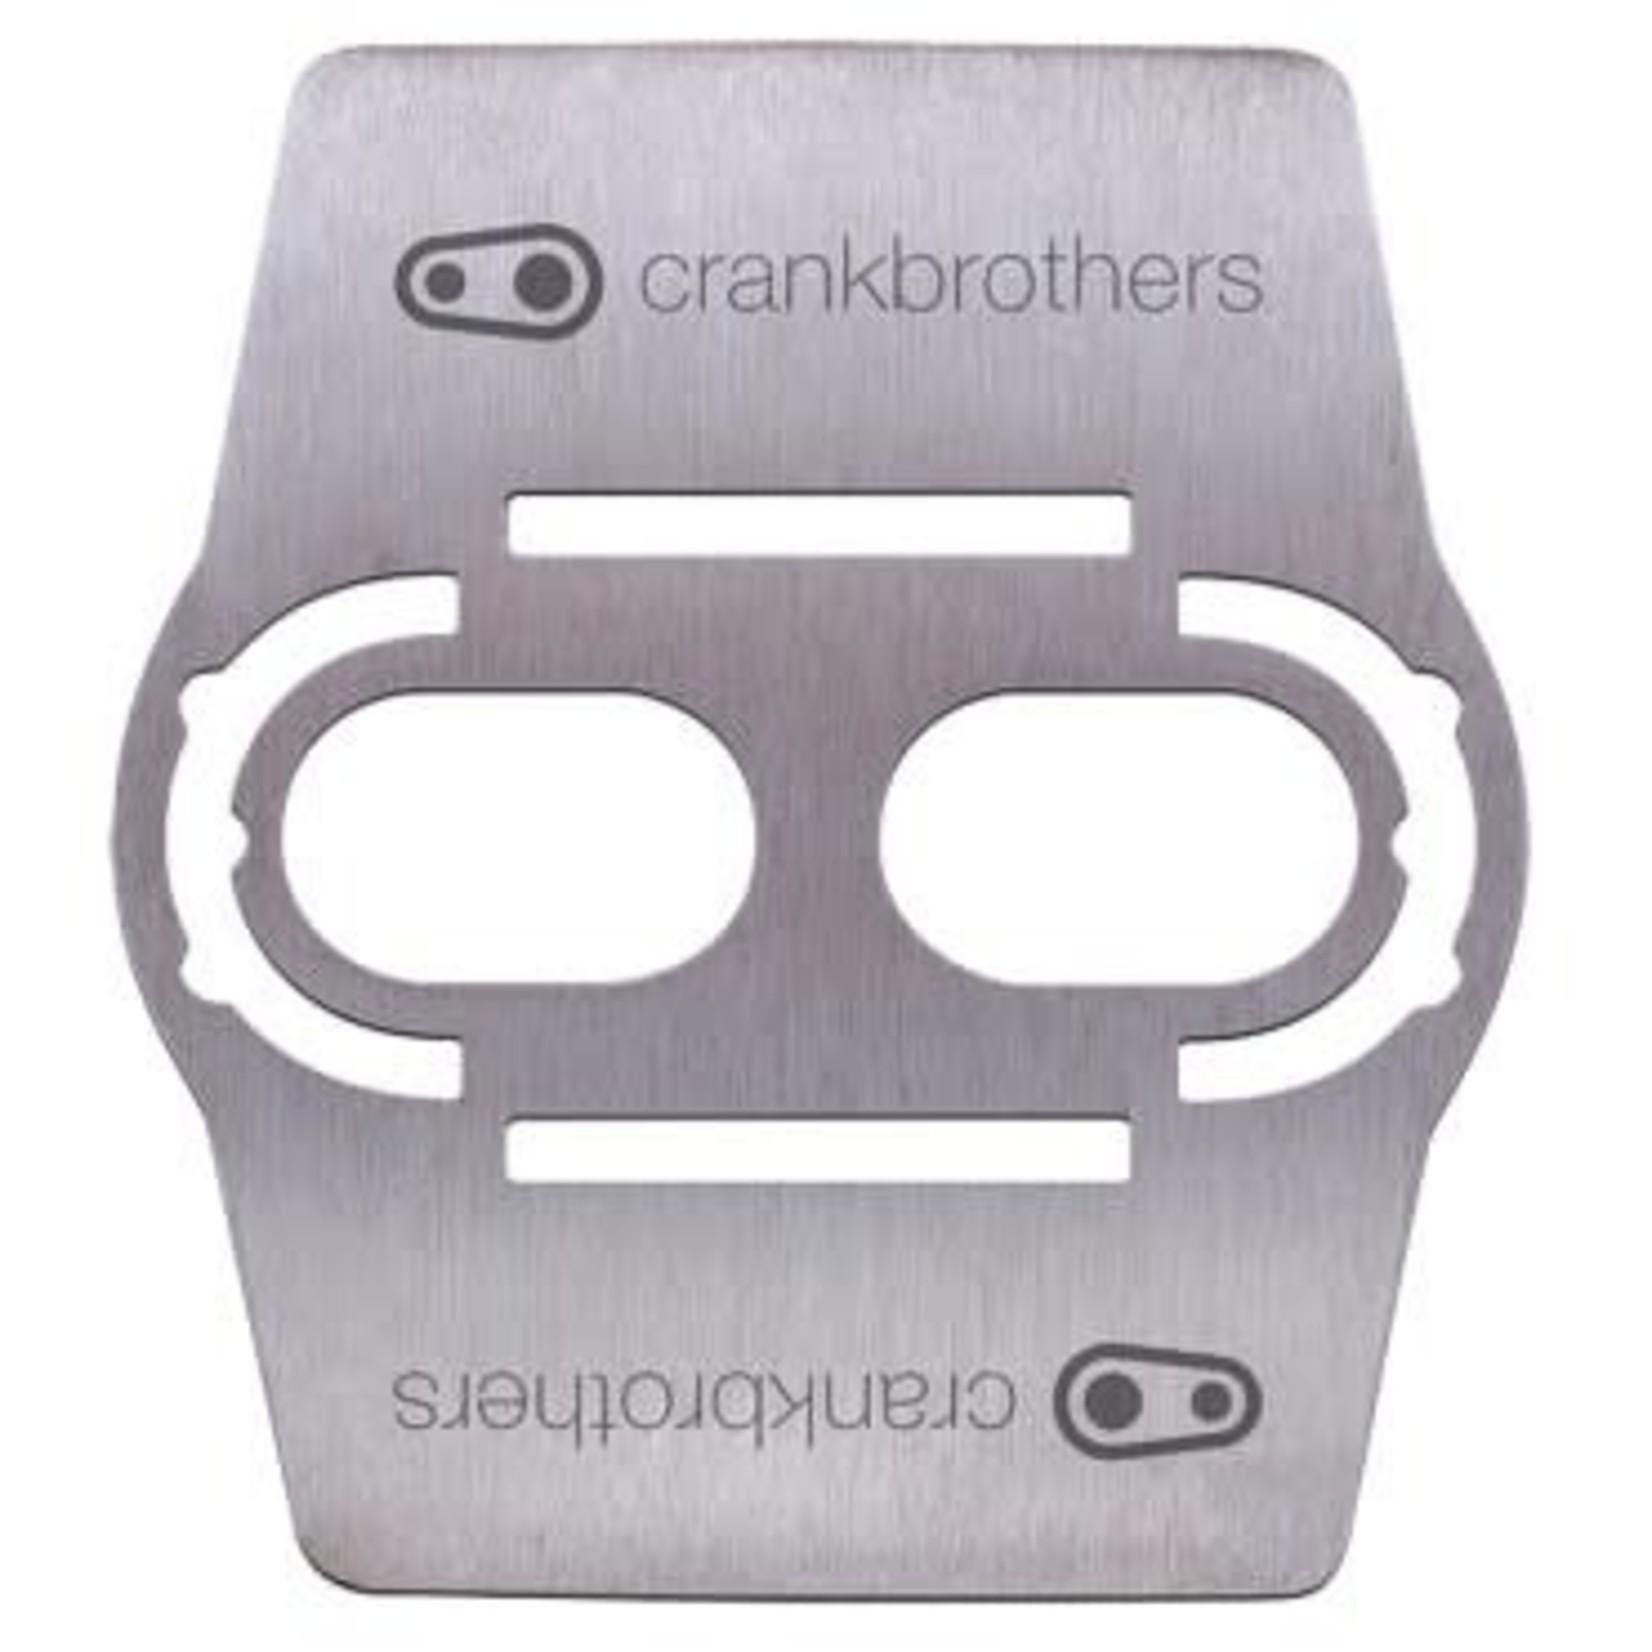 Crank Brothers Shoe Shields